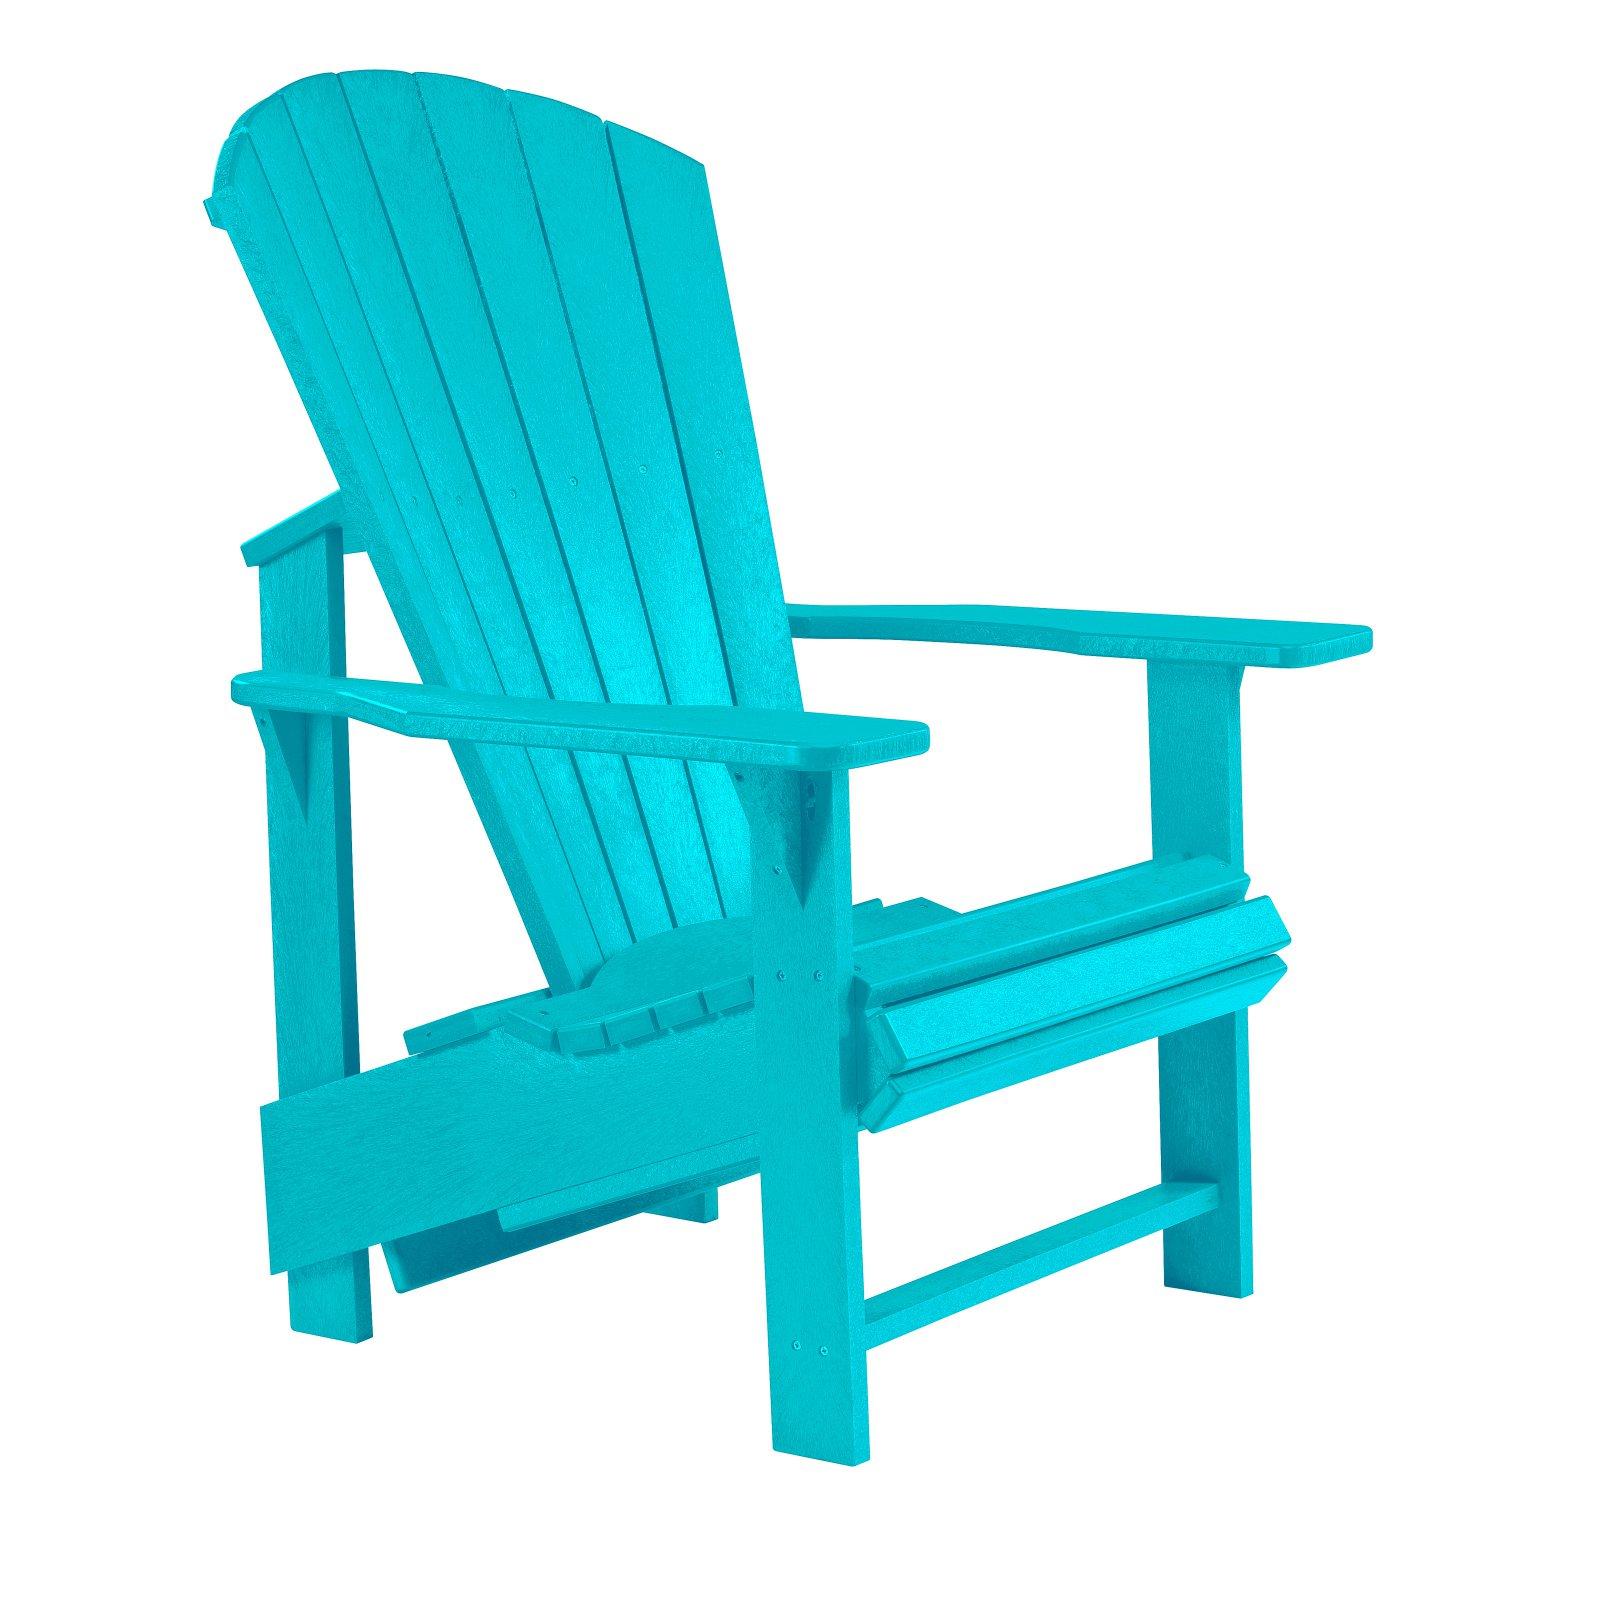 Outdoor C R Plastic Generations Upright Adirondack Chair